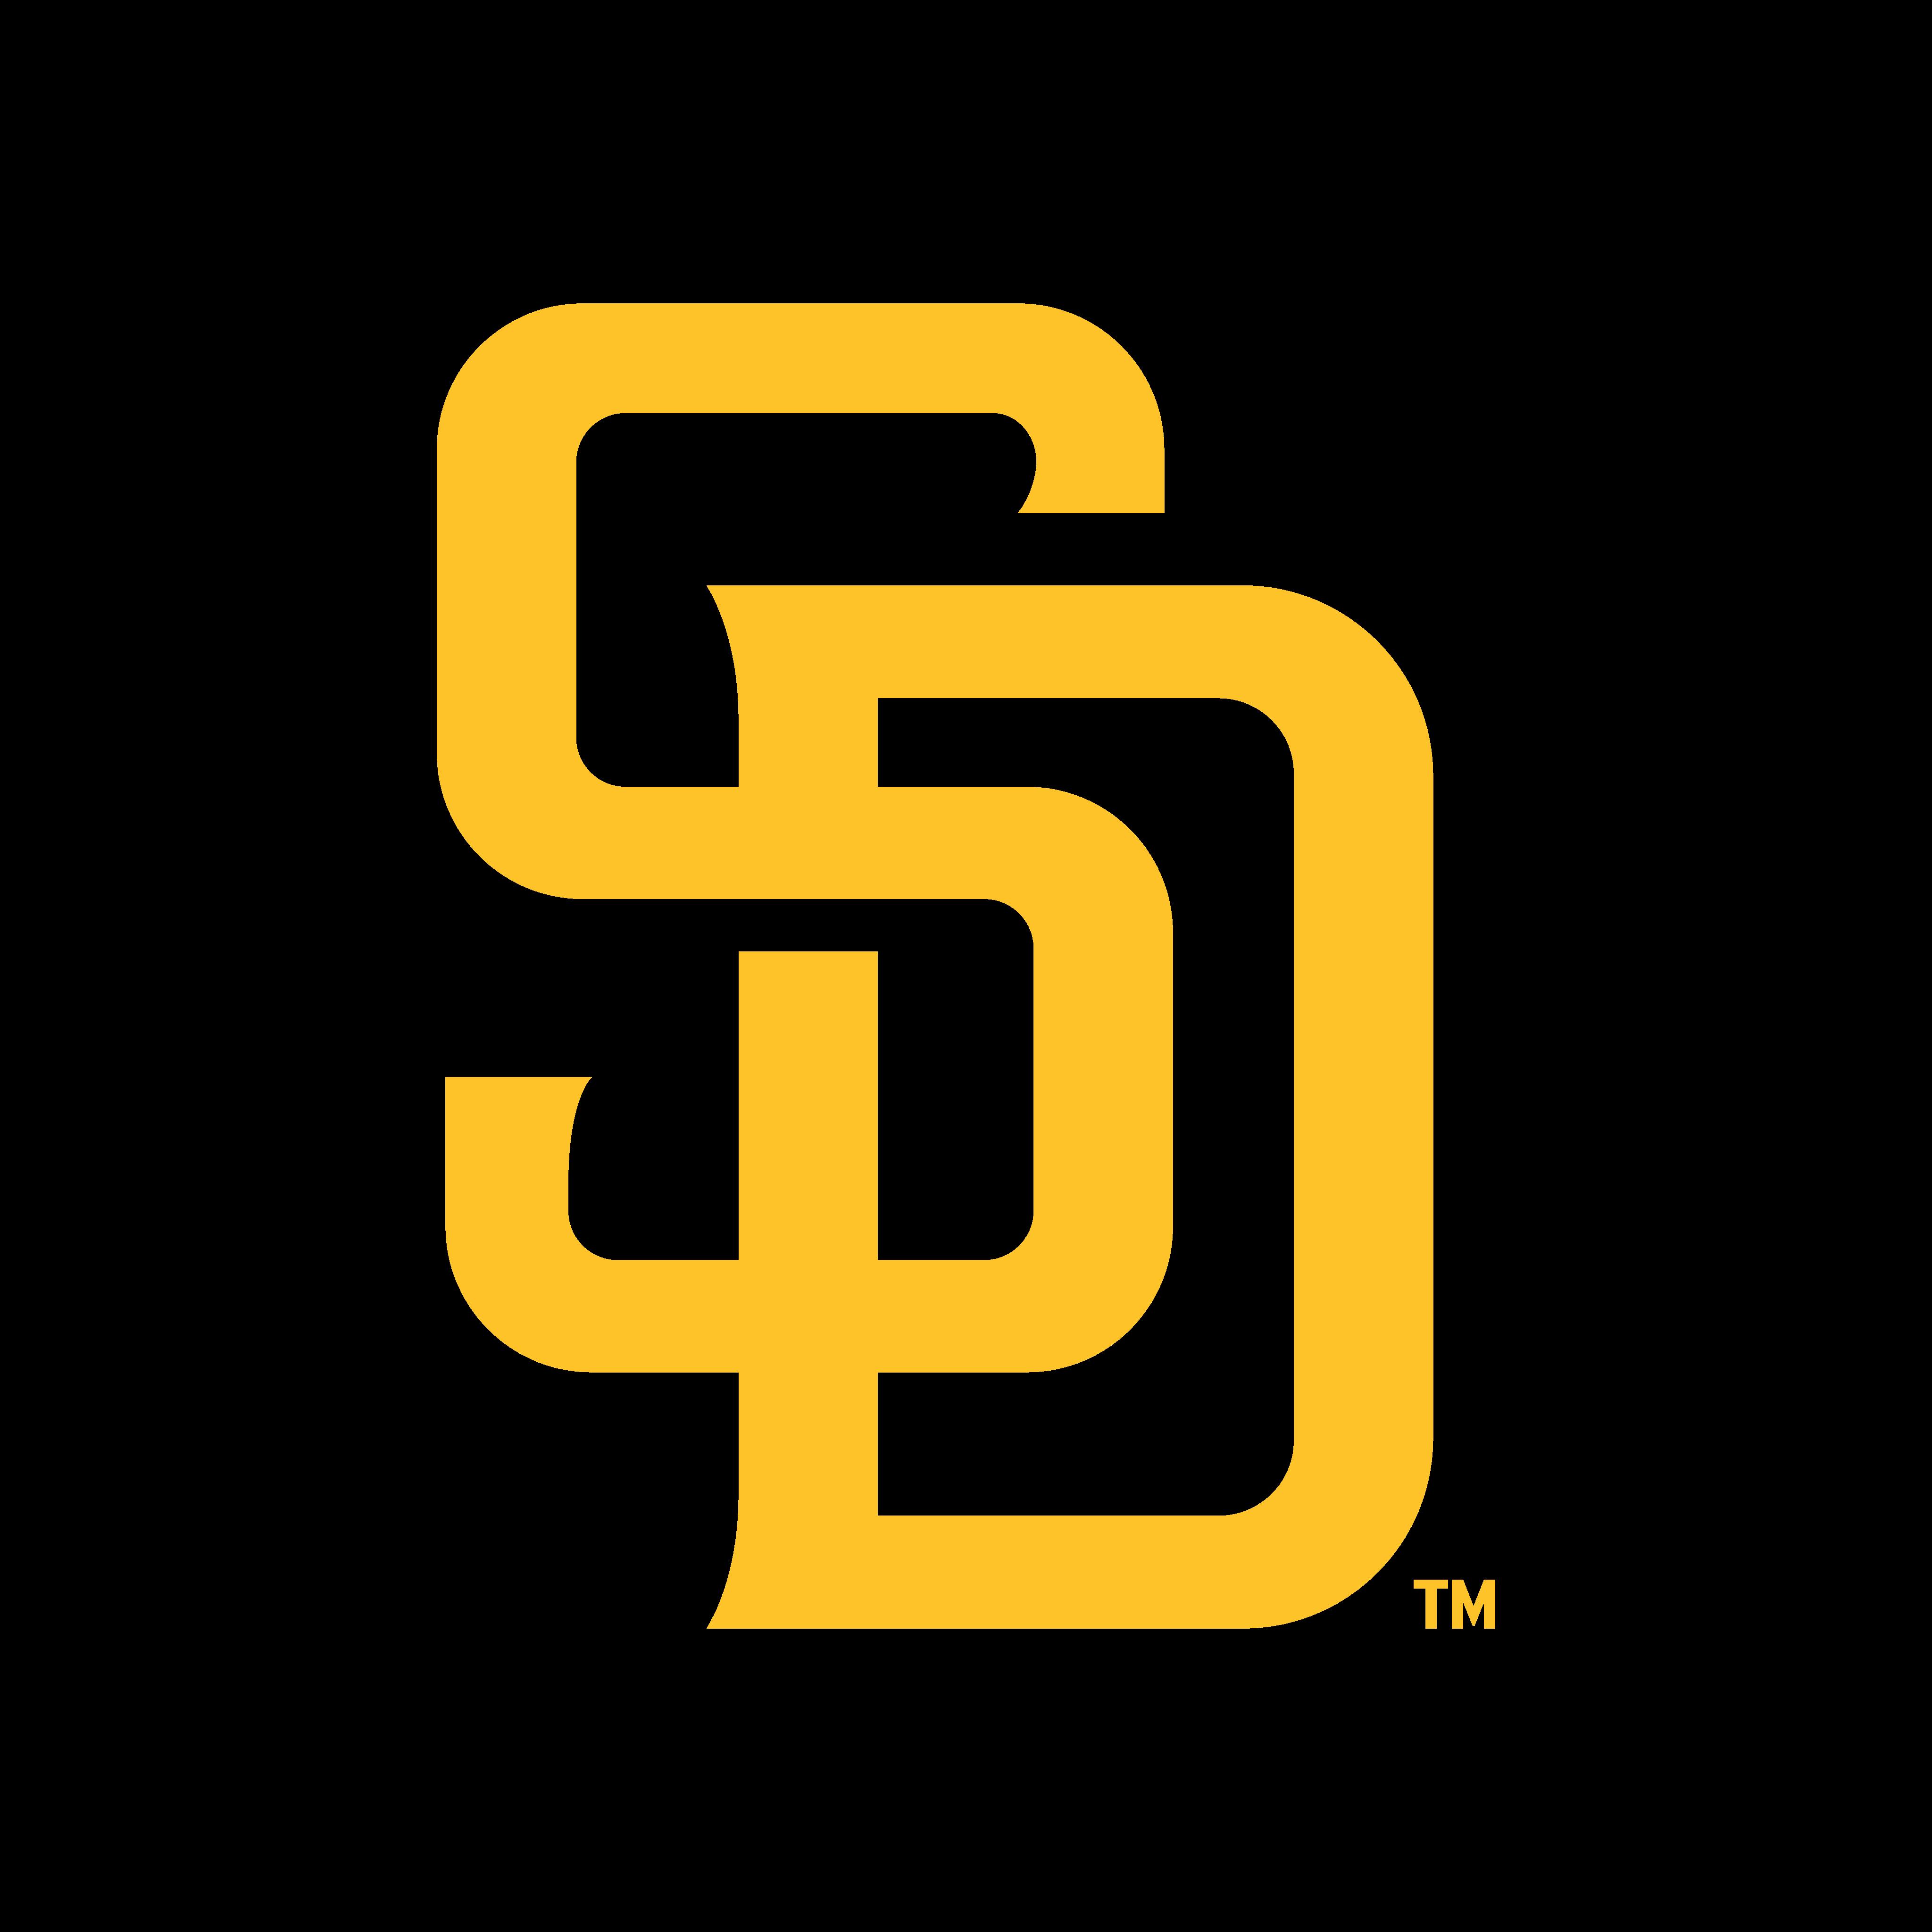 san diego padres logo 0 - San Diego Padres Logo